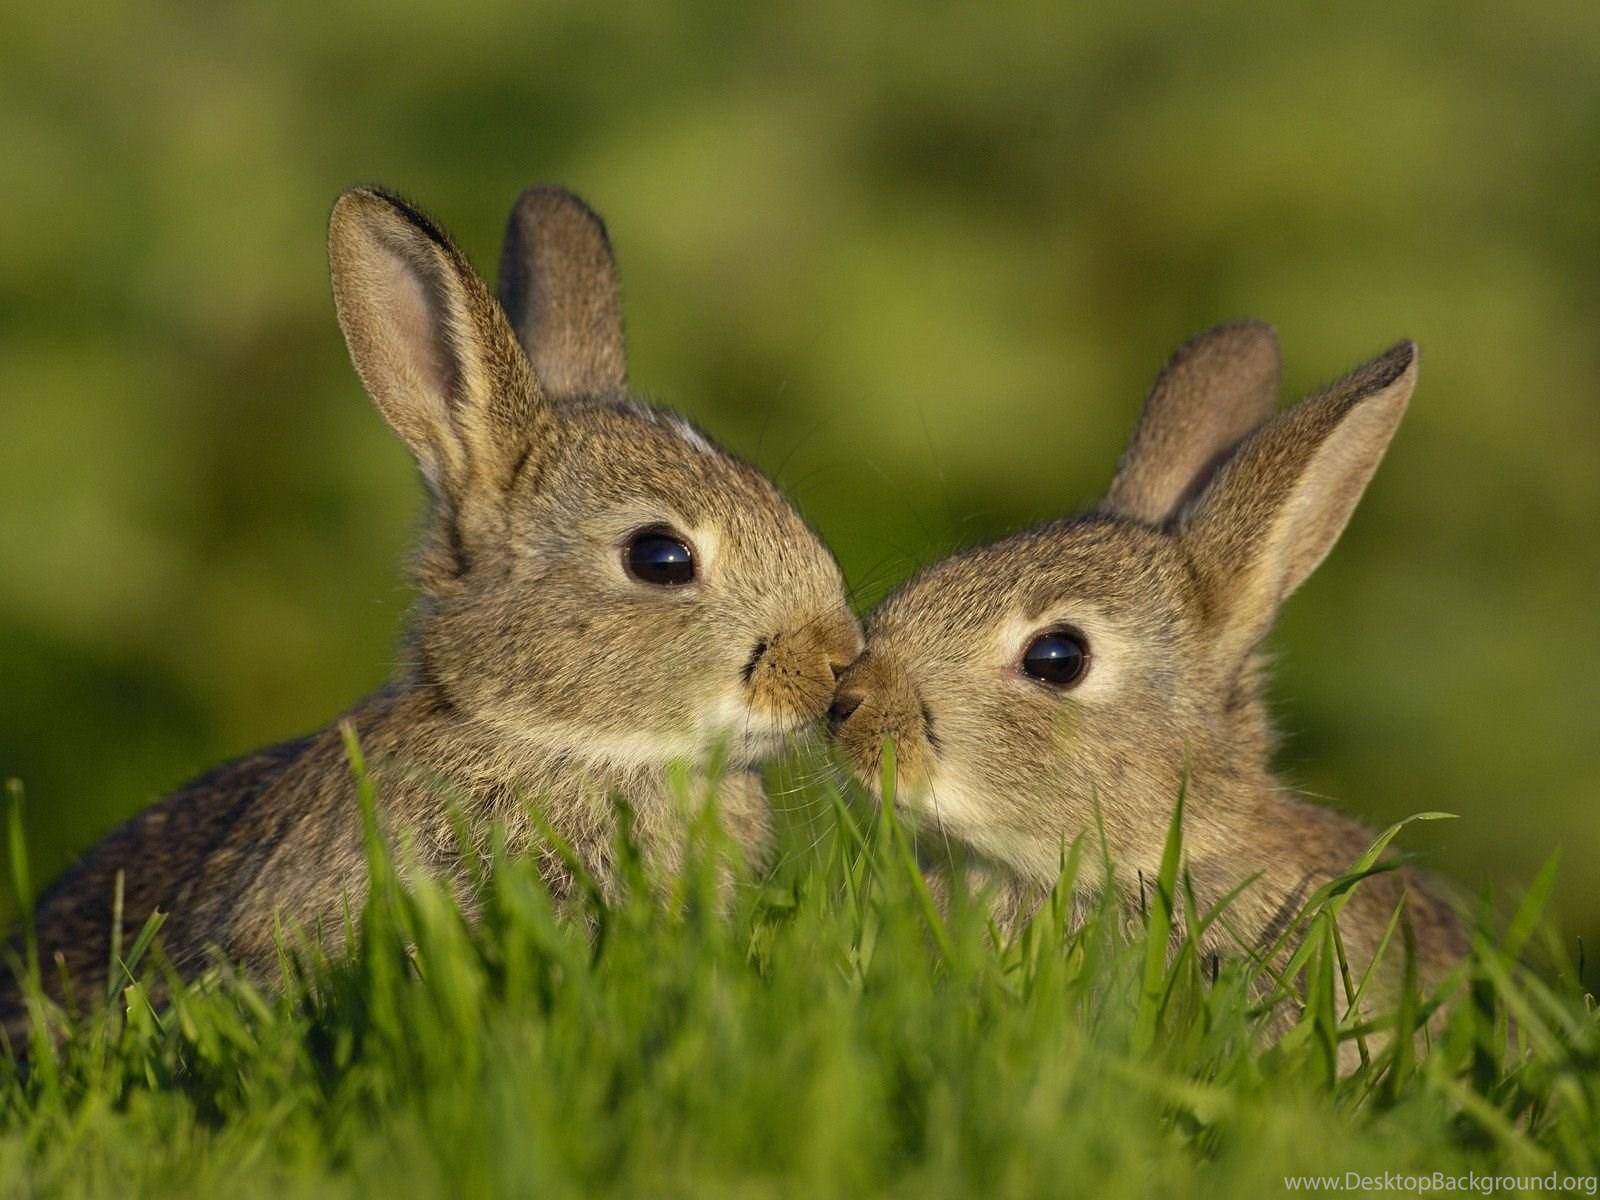 Wallpapers Rabbit Grass Bunny Kiss Desktop Wallpapers Animals Desktop Background